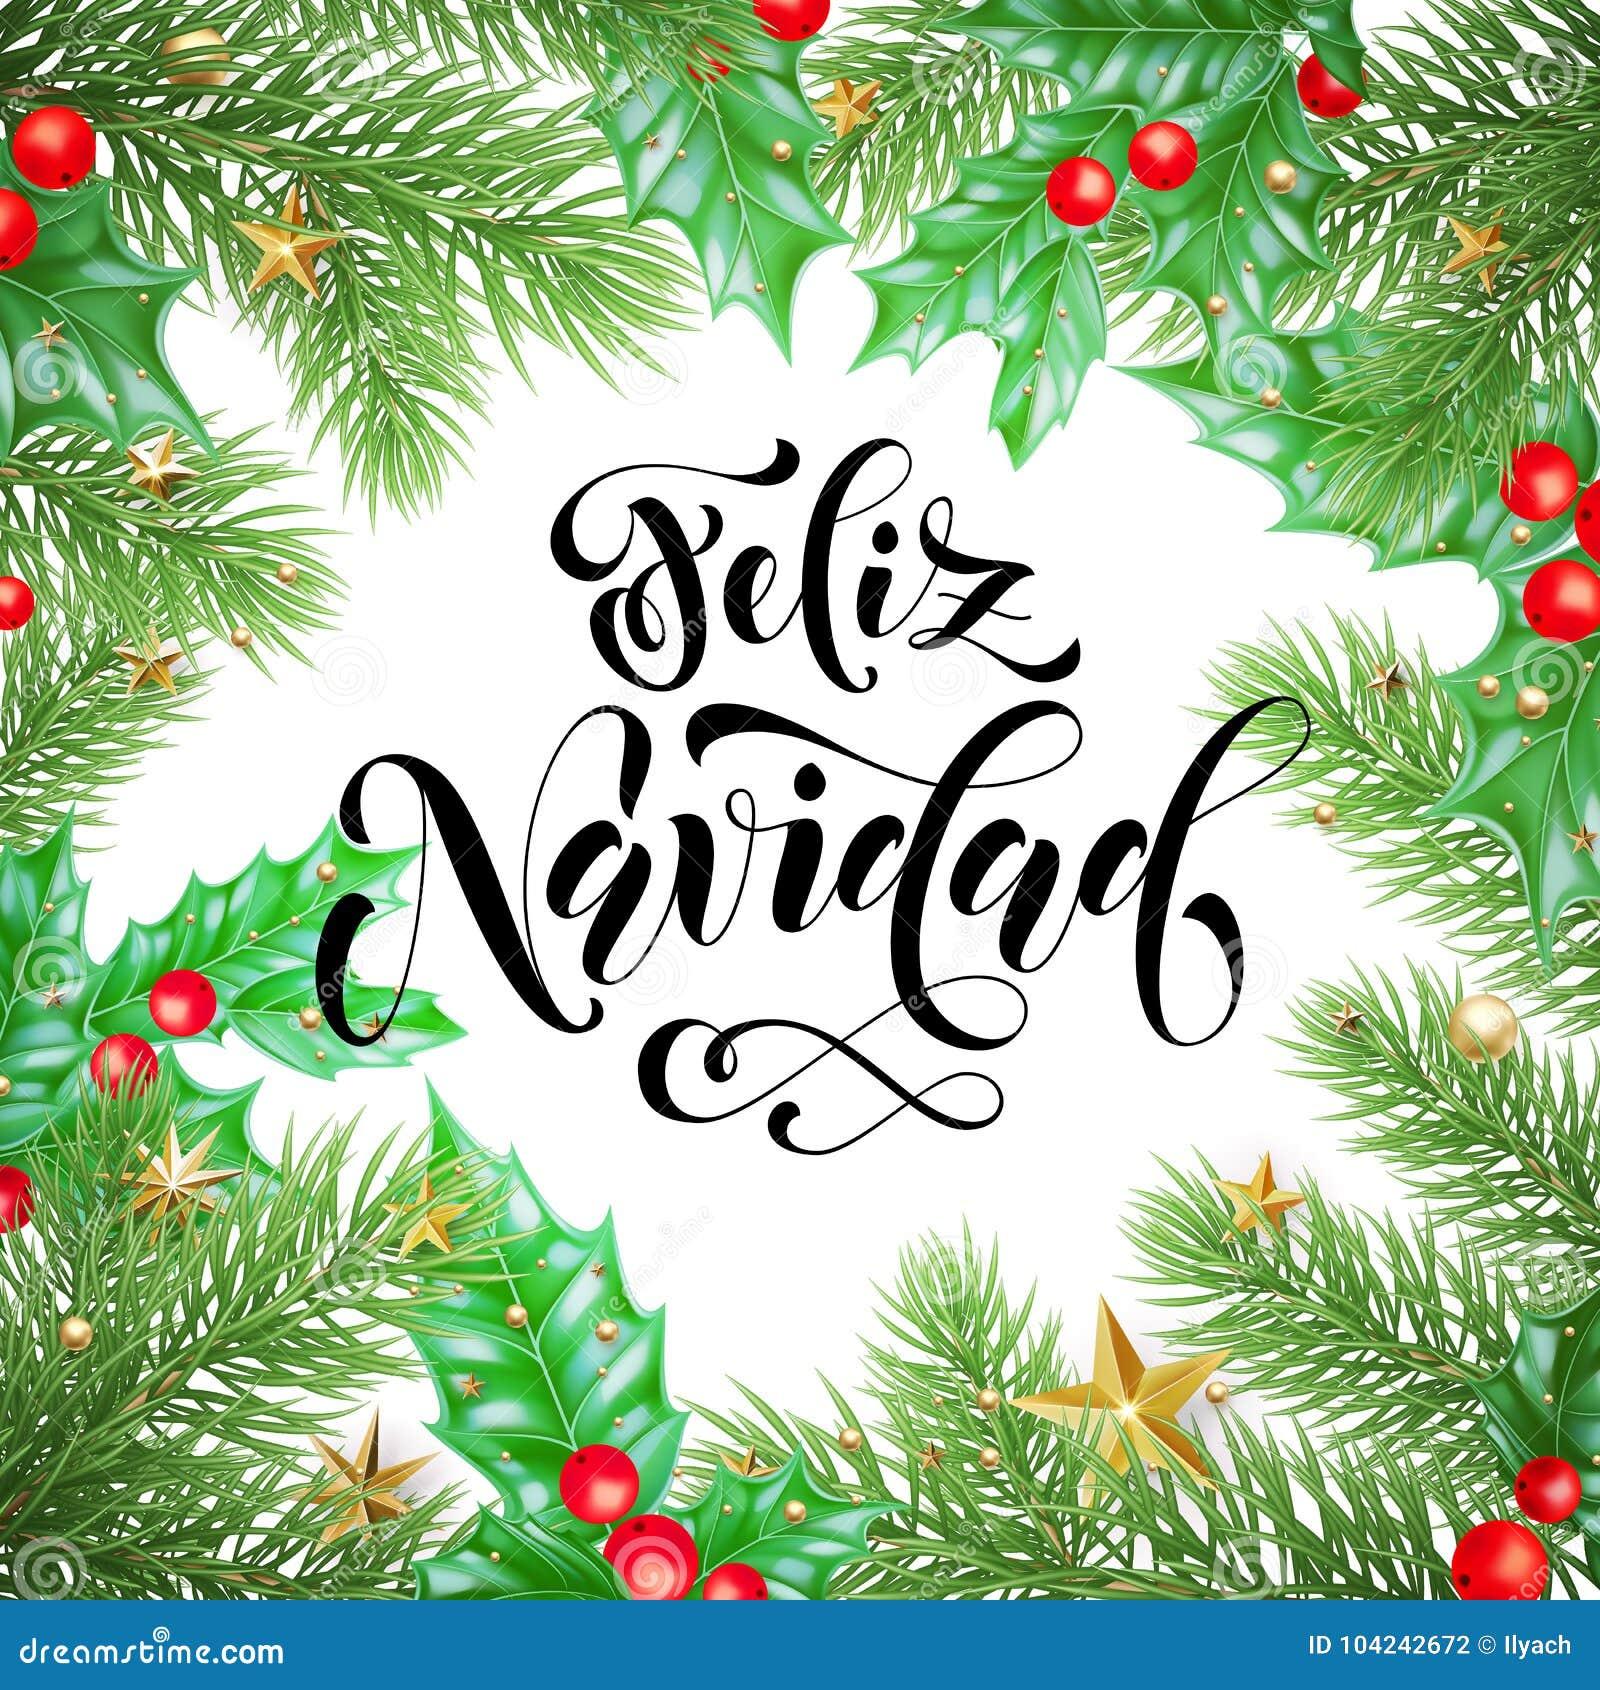 Feliz Navidad Cristmas.Feliz Navidad Spanish Merry Christmas Holiday Hand Drawn